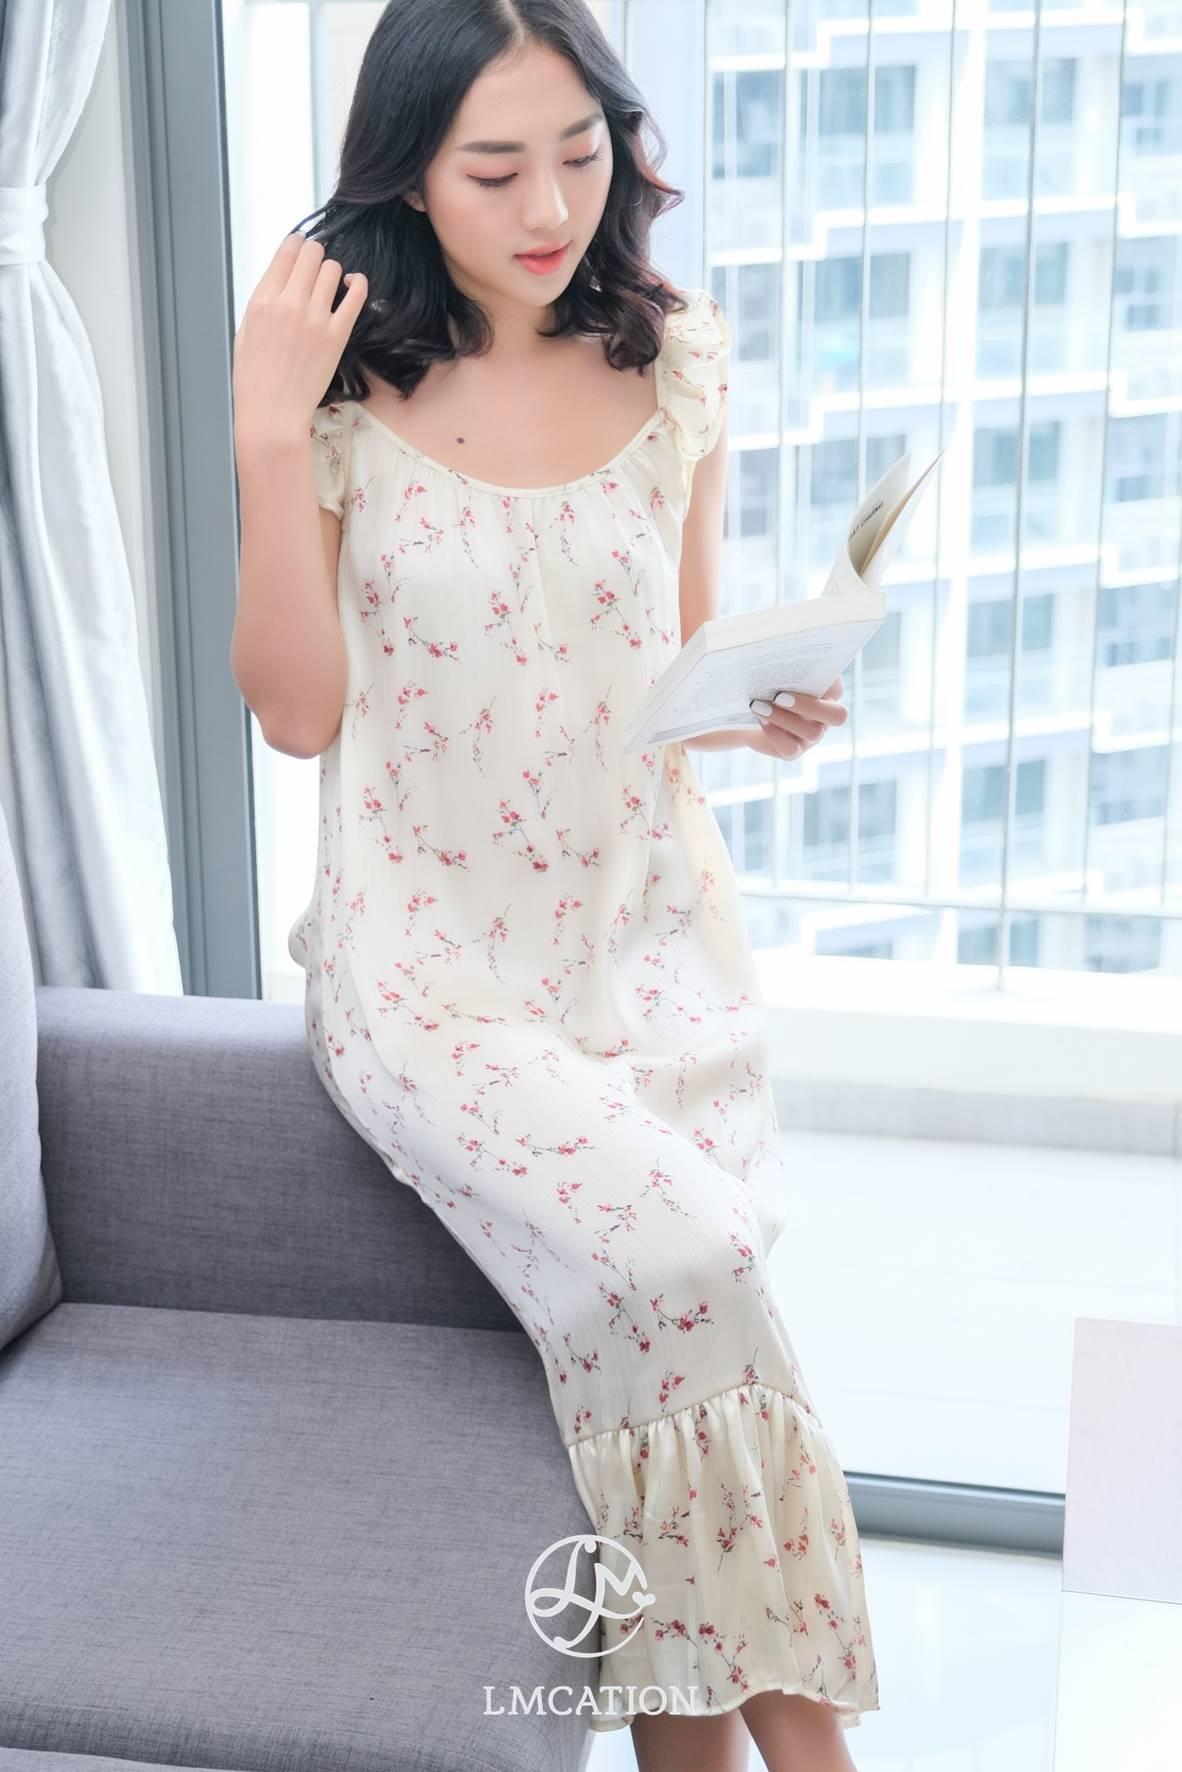 LMcation Susie Maxi Dress - Floral